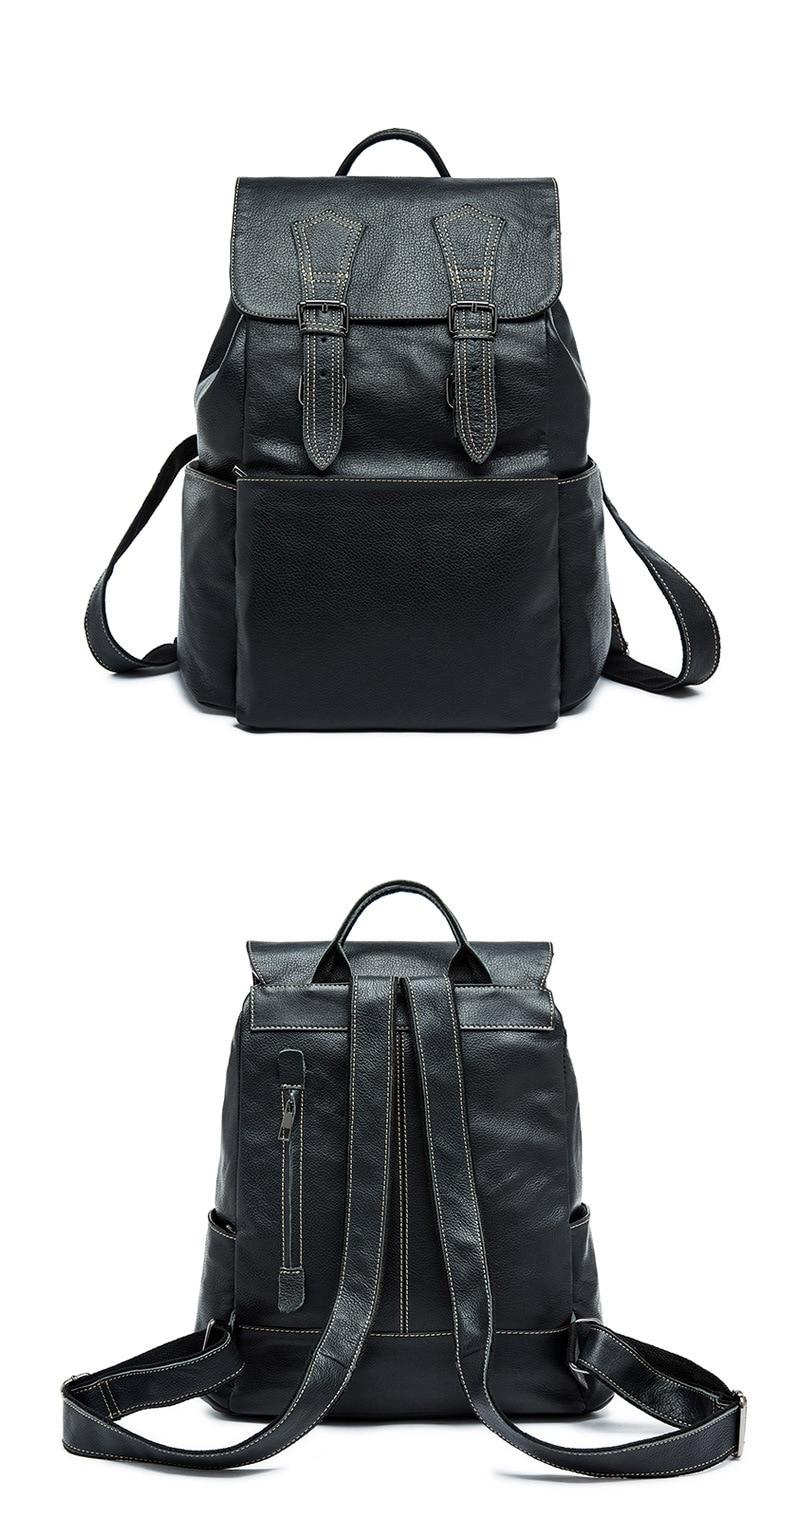 Genuine Leather Men Backpacks 13 inch Laptop Bags Fashion School Backpack Teenagers Vintage Bagpack Travel Bag Mochila Notebook